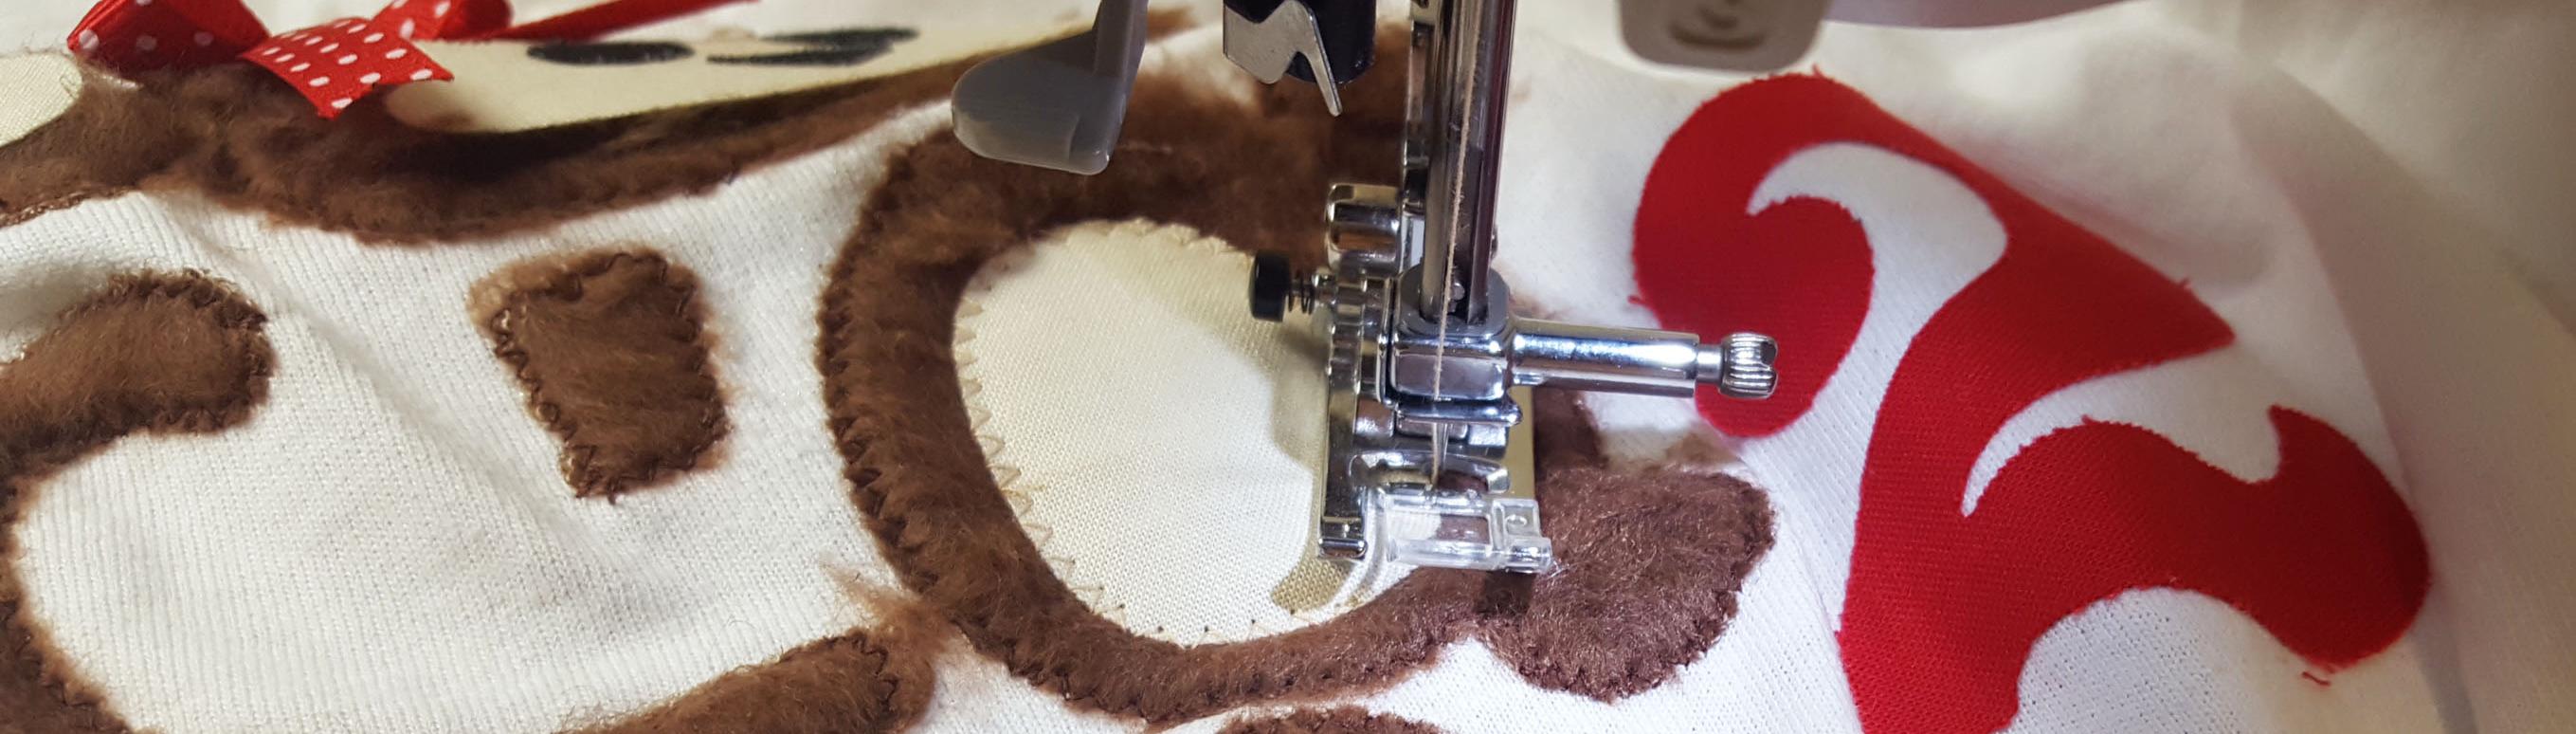 Sewing-applique-(1)